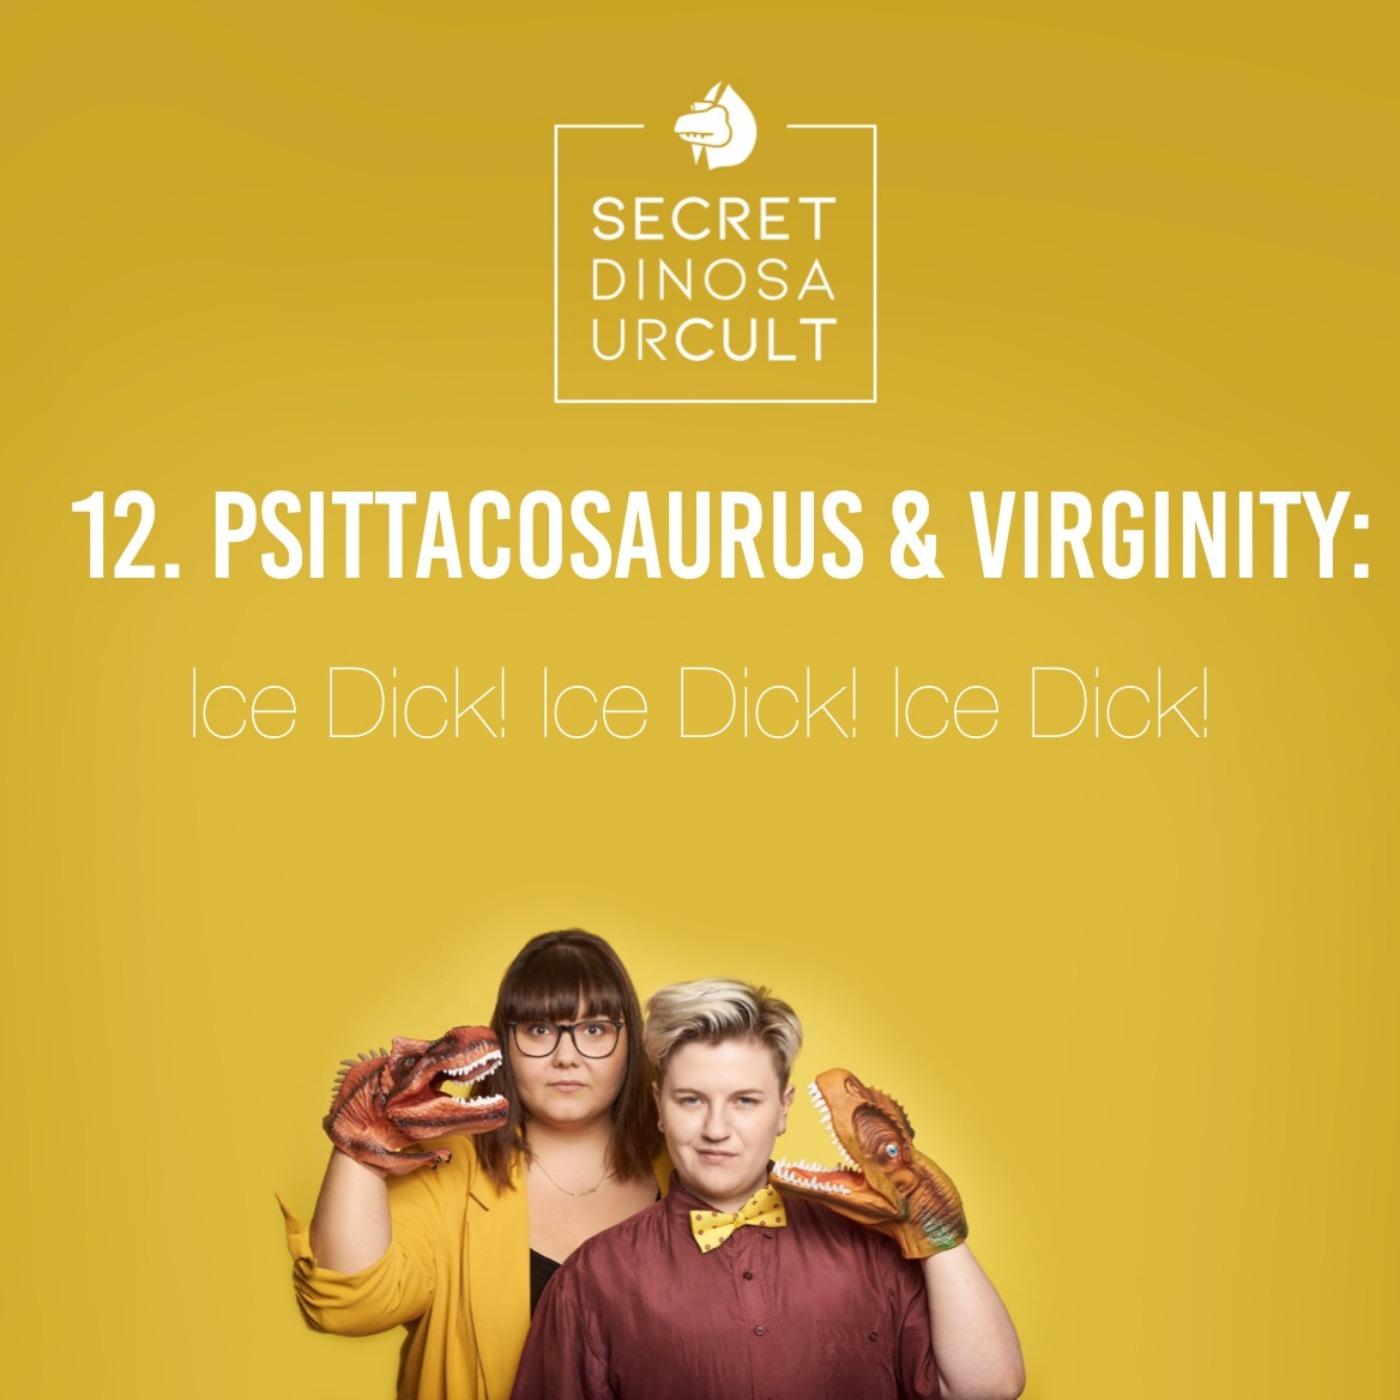 12. Psittacosaurus & Virginity: Ice Dick! Ice Dick! Ice Dick!